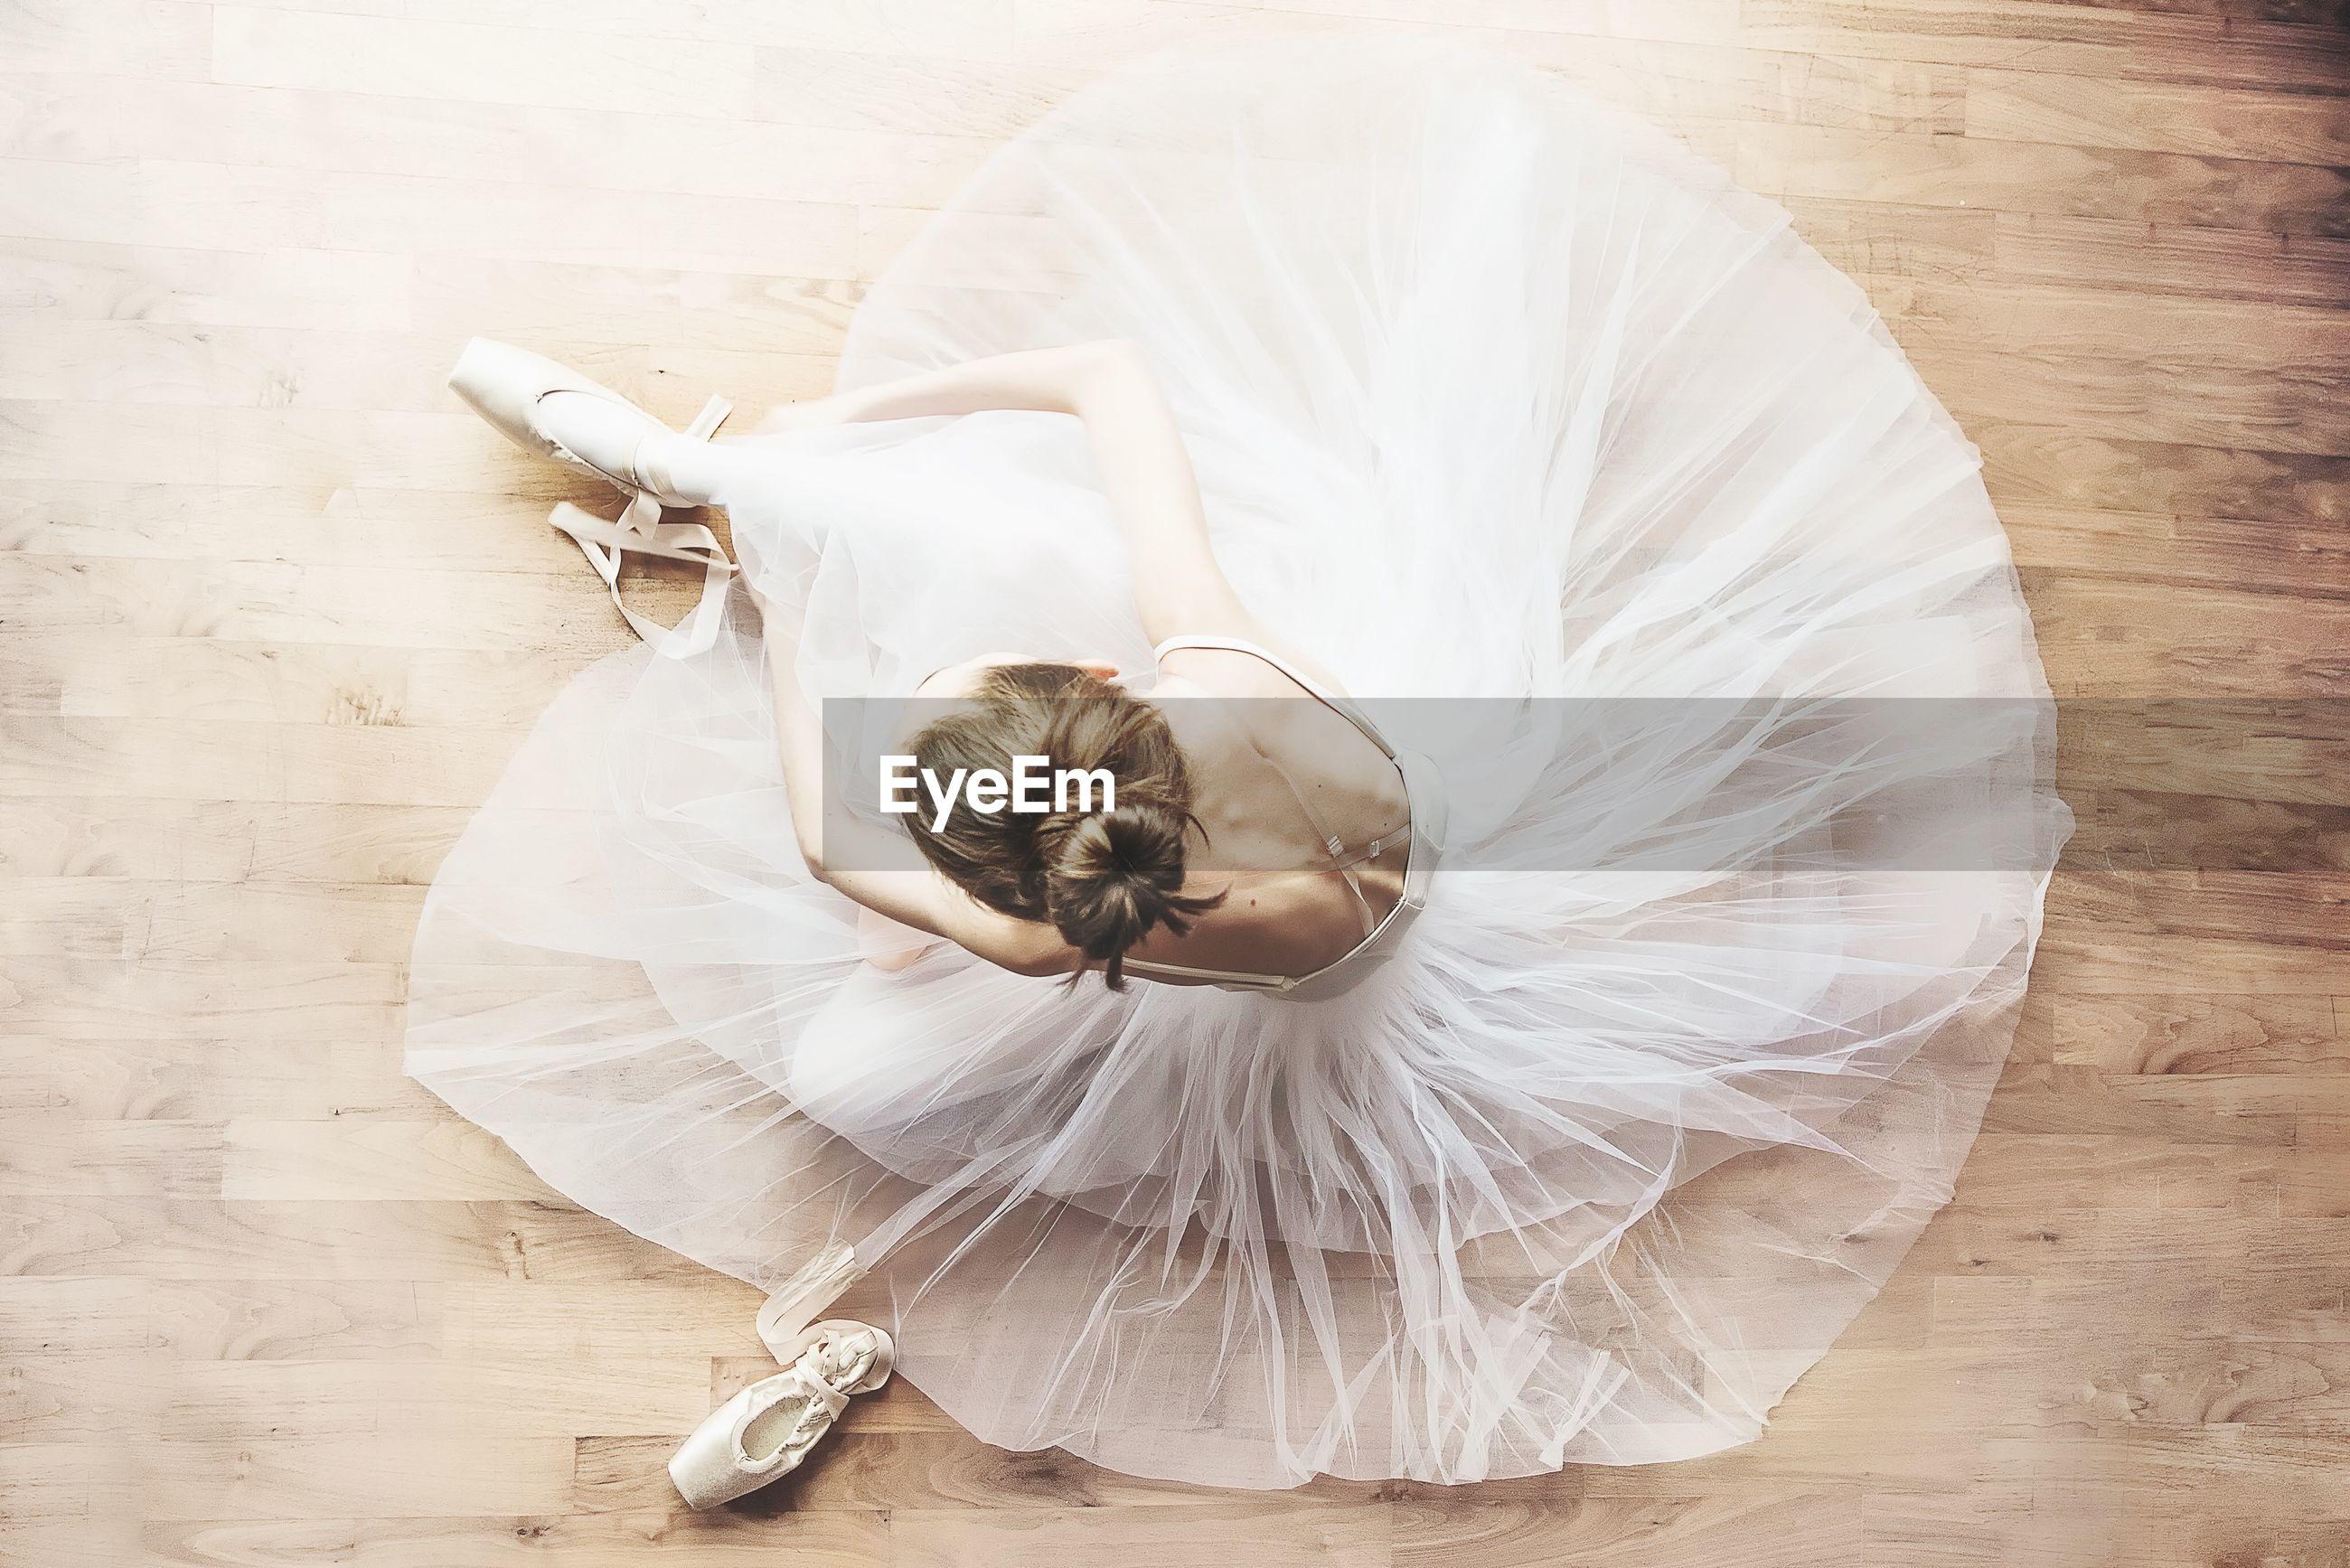 High angle view of ballerina sitting on hardwood floor